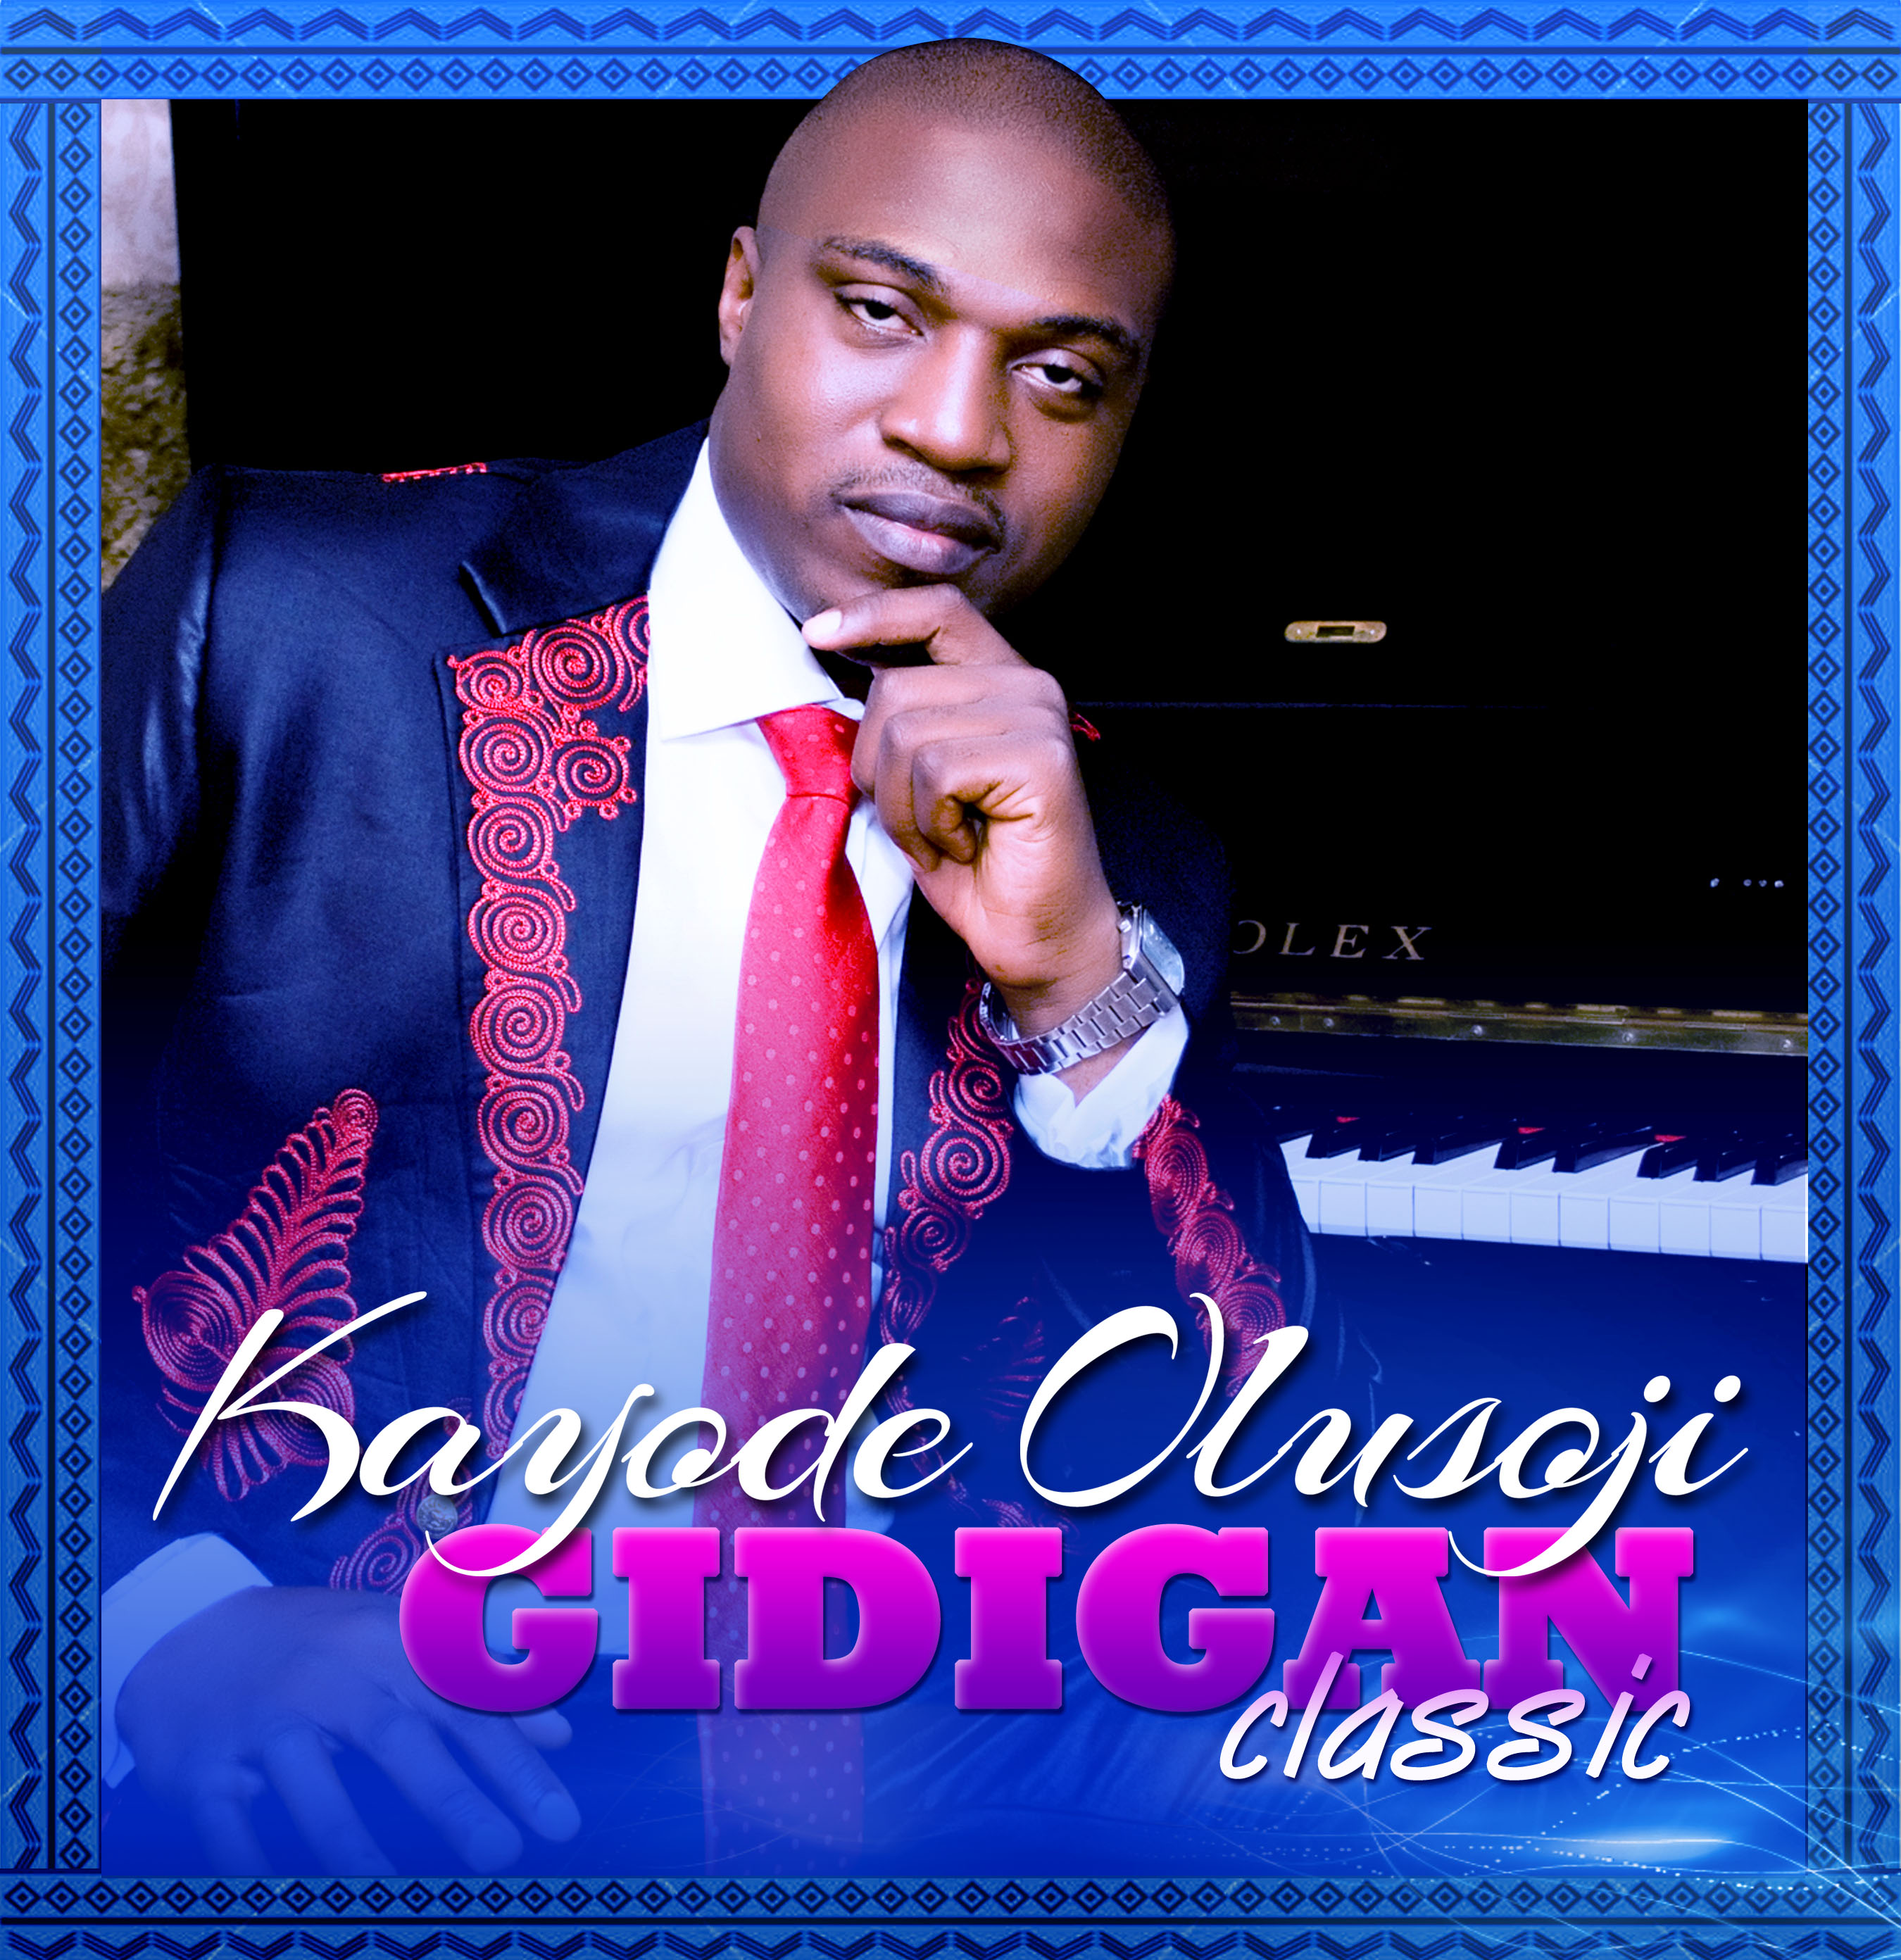 Gidi Gan Classic Album by Kayode Olusoji